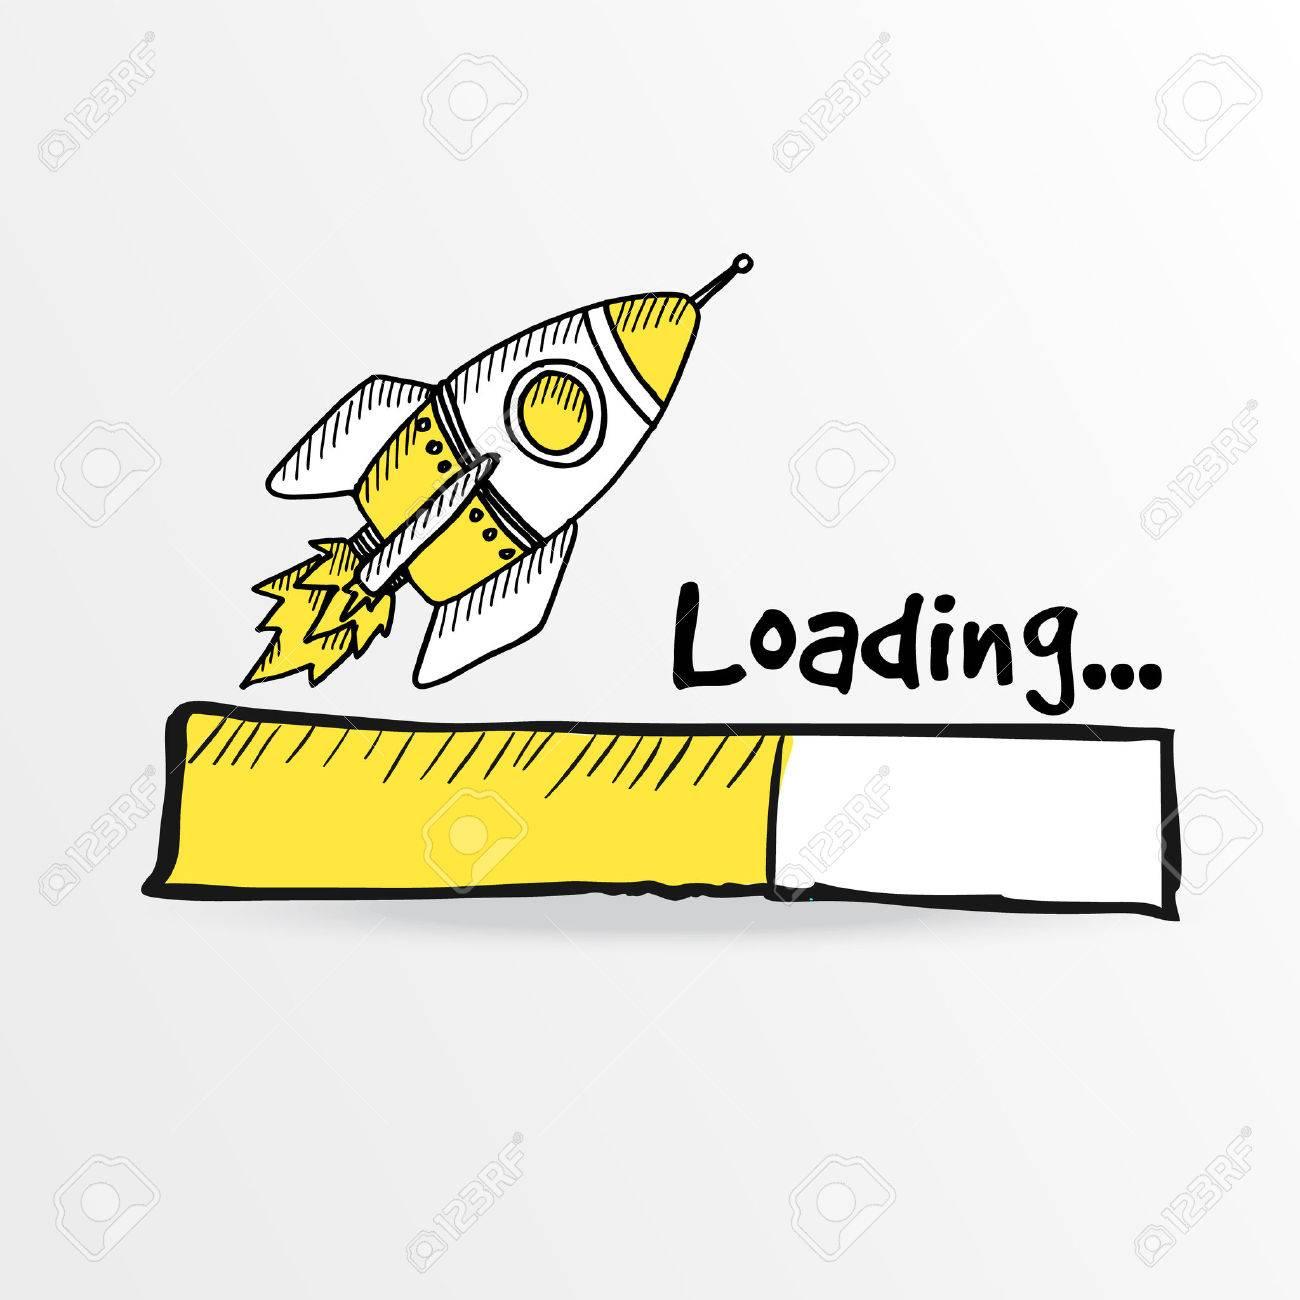 Loading bar with a doodle rocket, vector illustration - 37117376